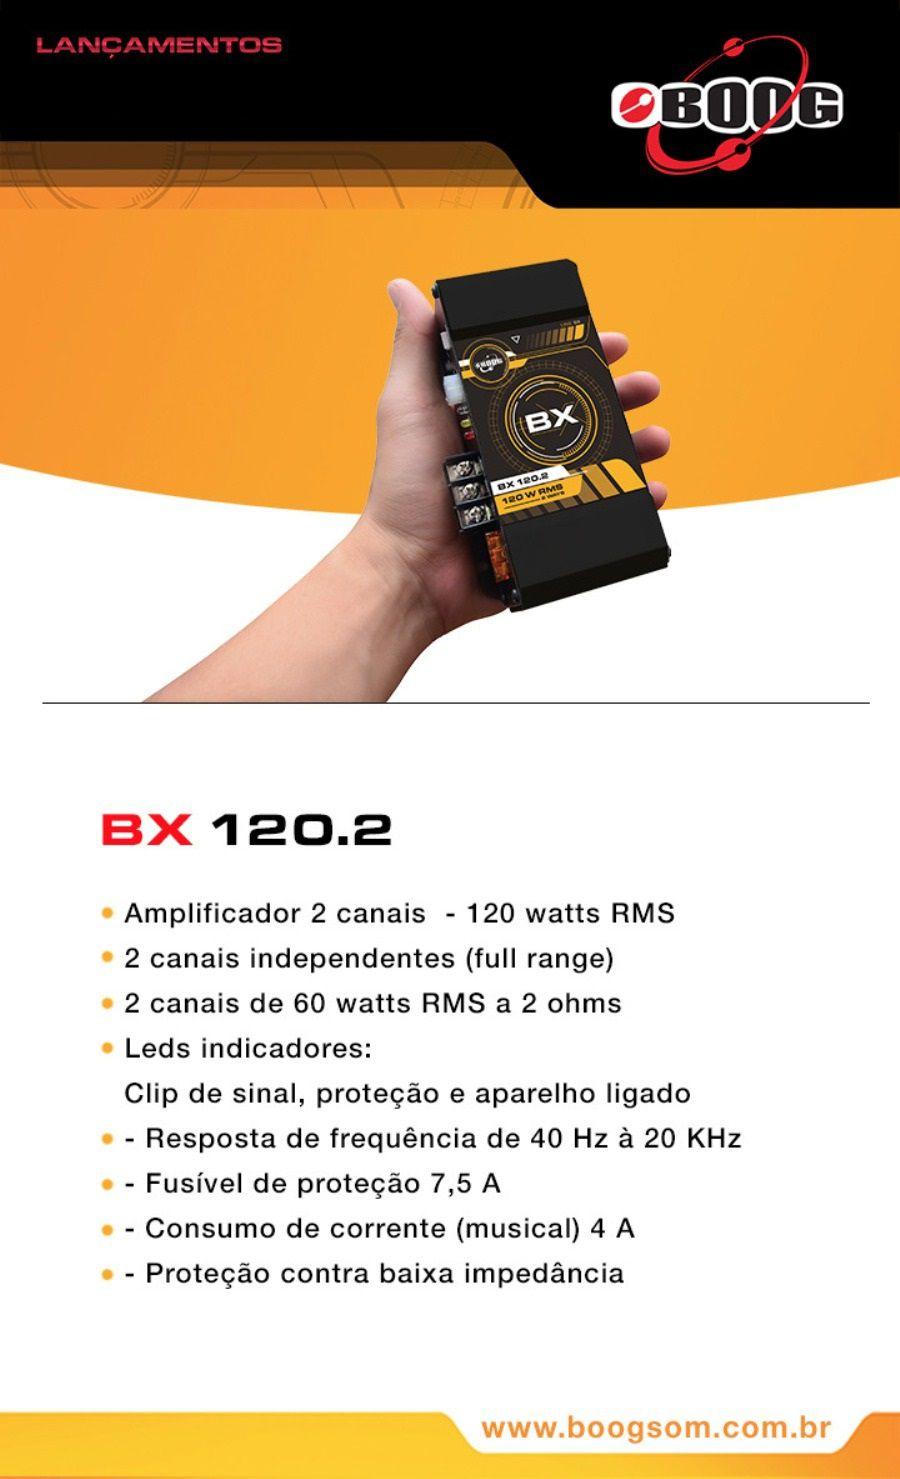 AMPLIFICADOR BOOG BX 120.2 MÓDULO DIGITAL 2 CANAIS 120W RMS